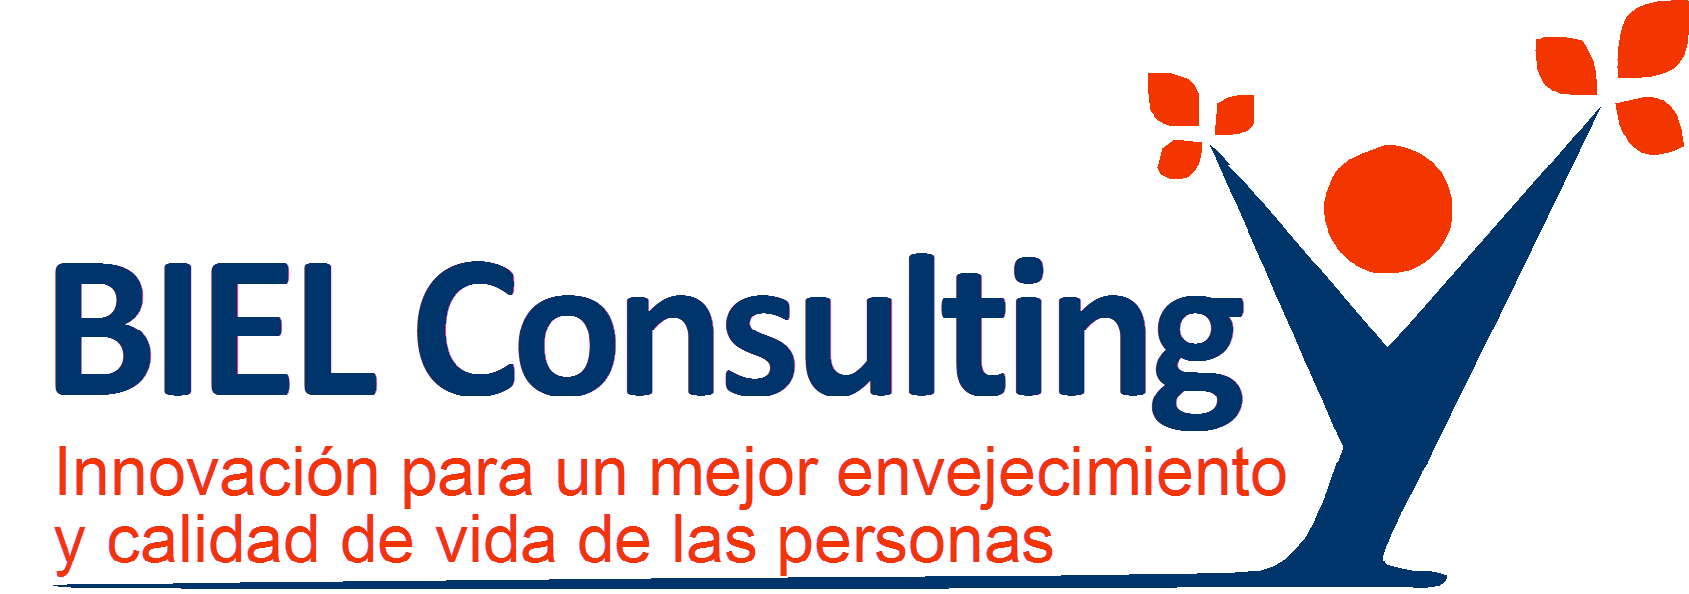 Biel Consulting